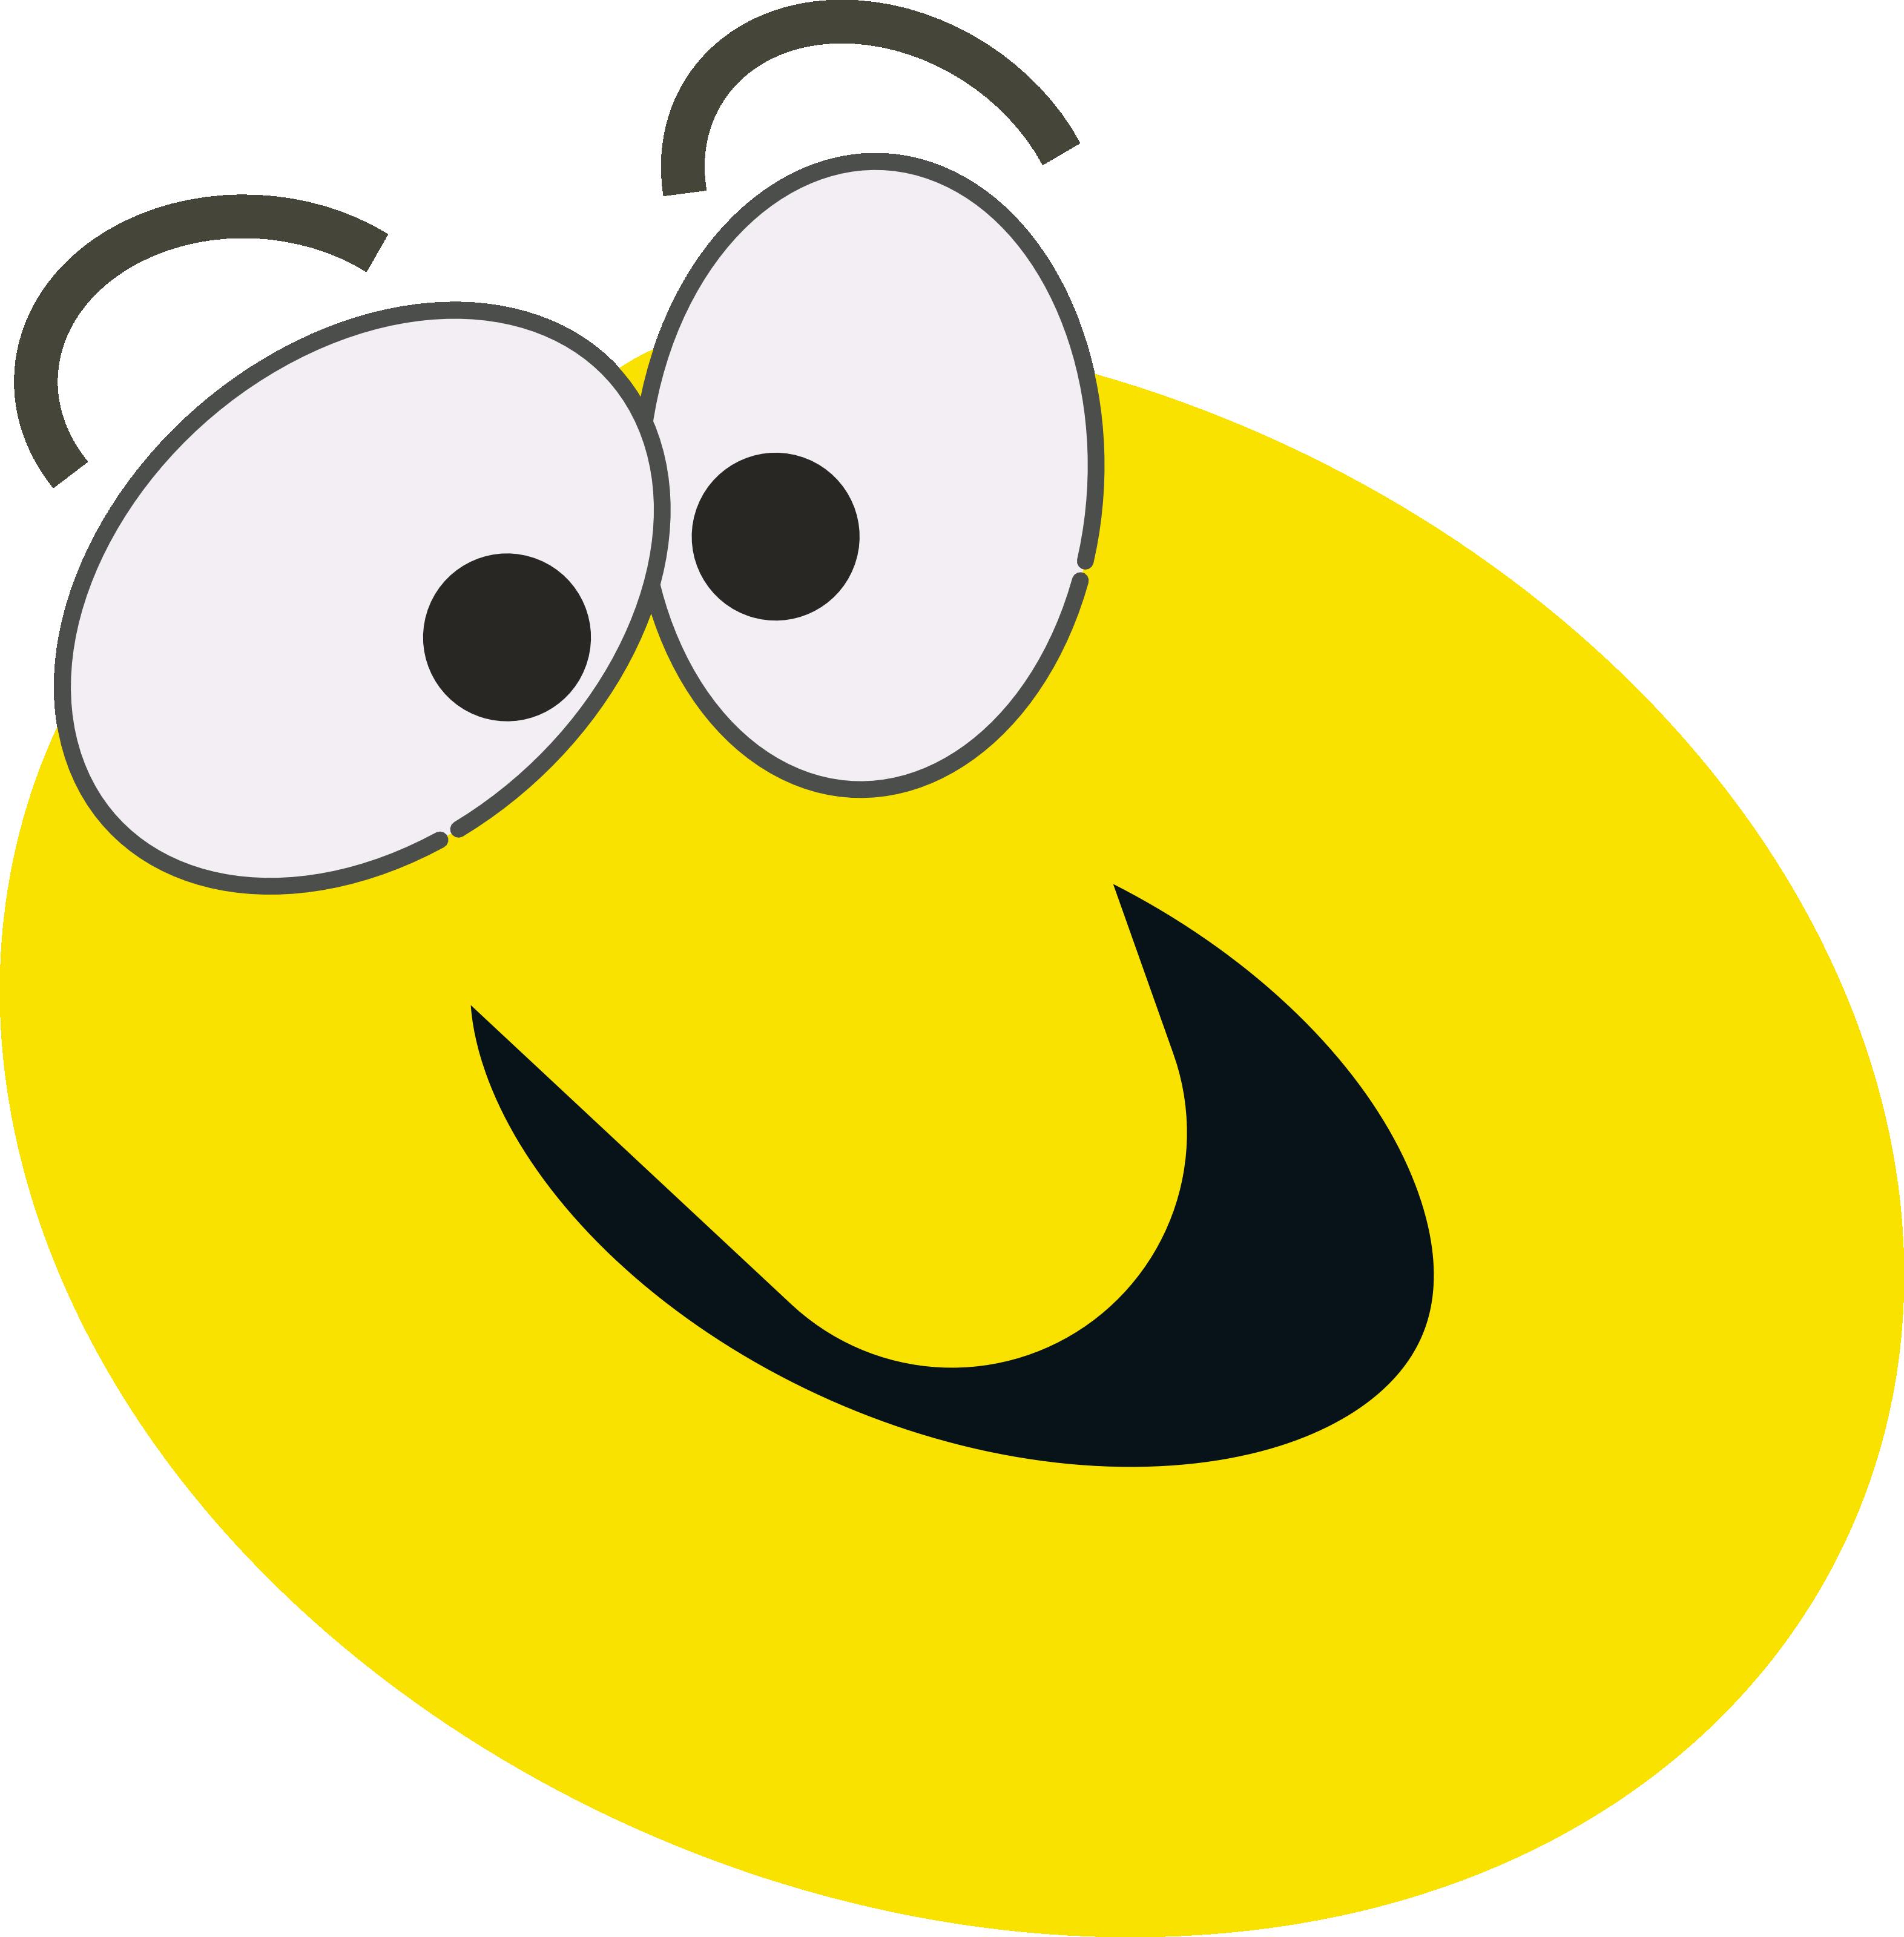 Smiley face happy face clip art free 3 c-Smiley face happy face clip art free 3 clipartcow-14